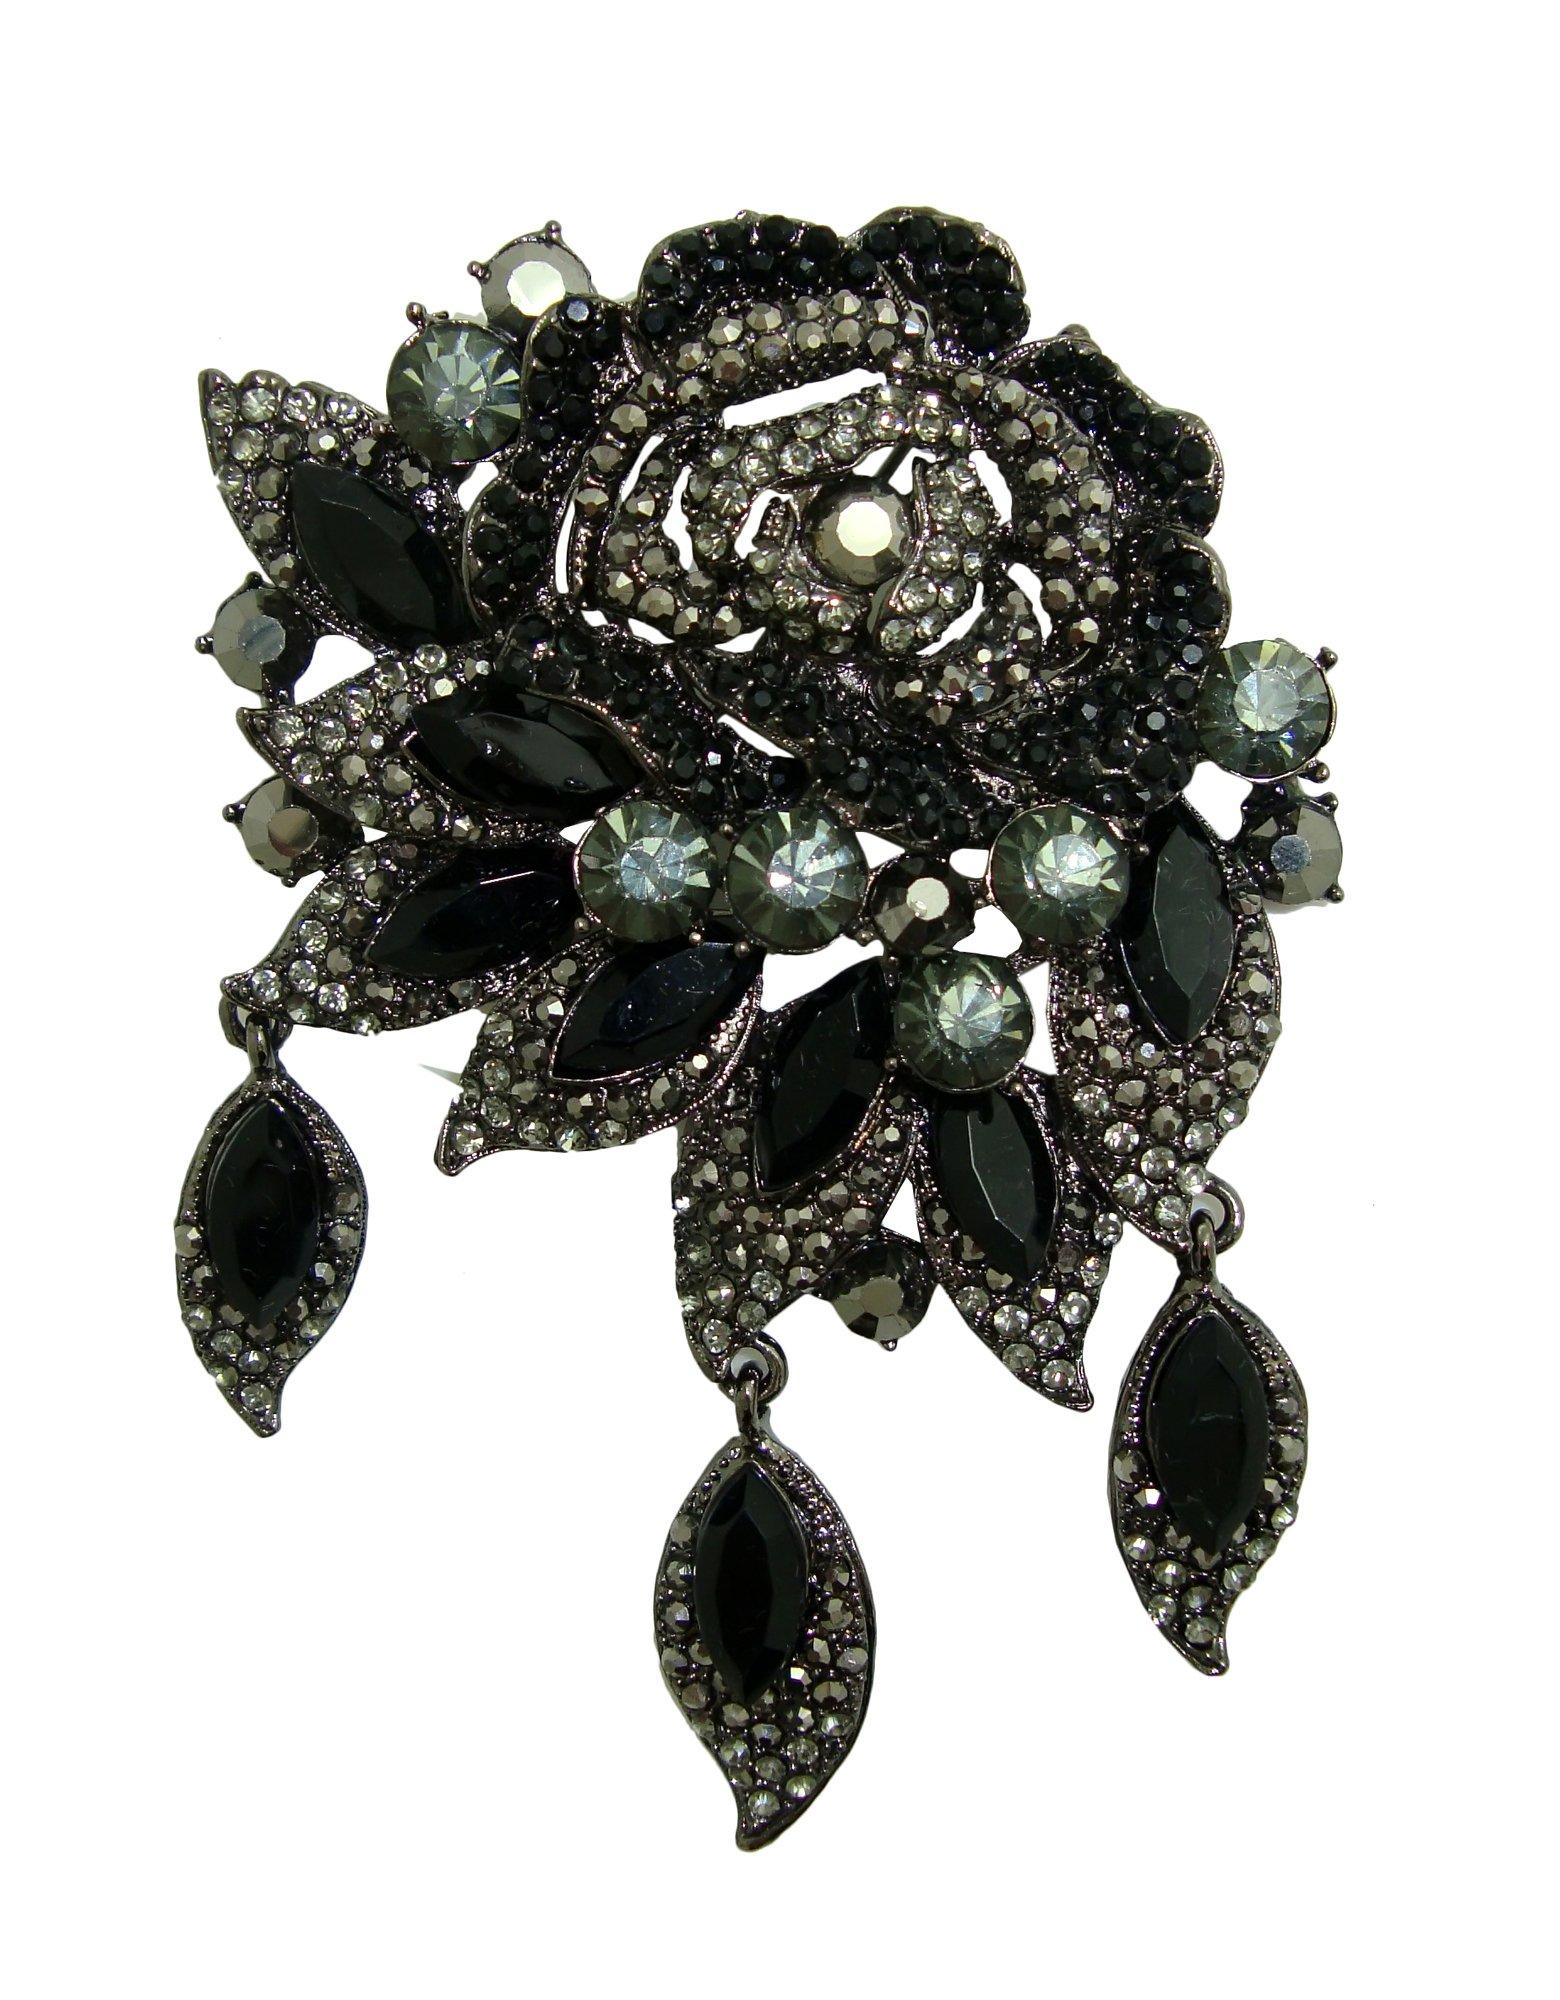 TTjewelry 3.94'' Vintage Style Art Deco Flower Rose Brooch Pin Pendant Rhinestone Crystal (Black)